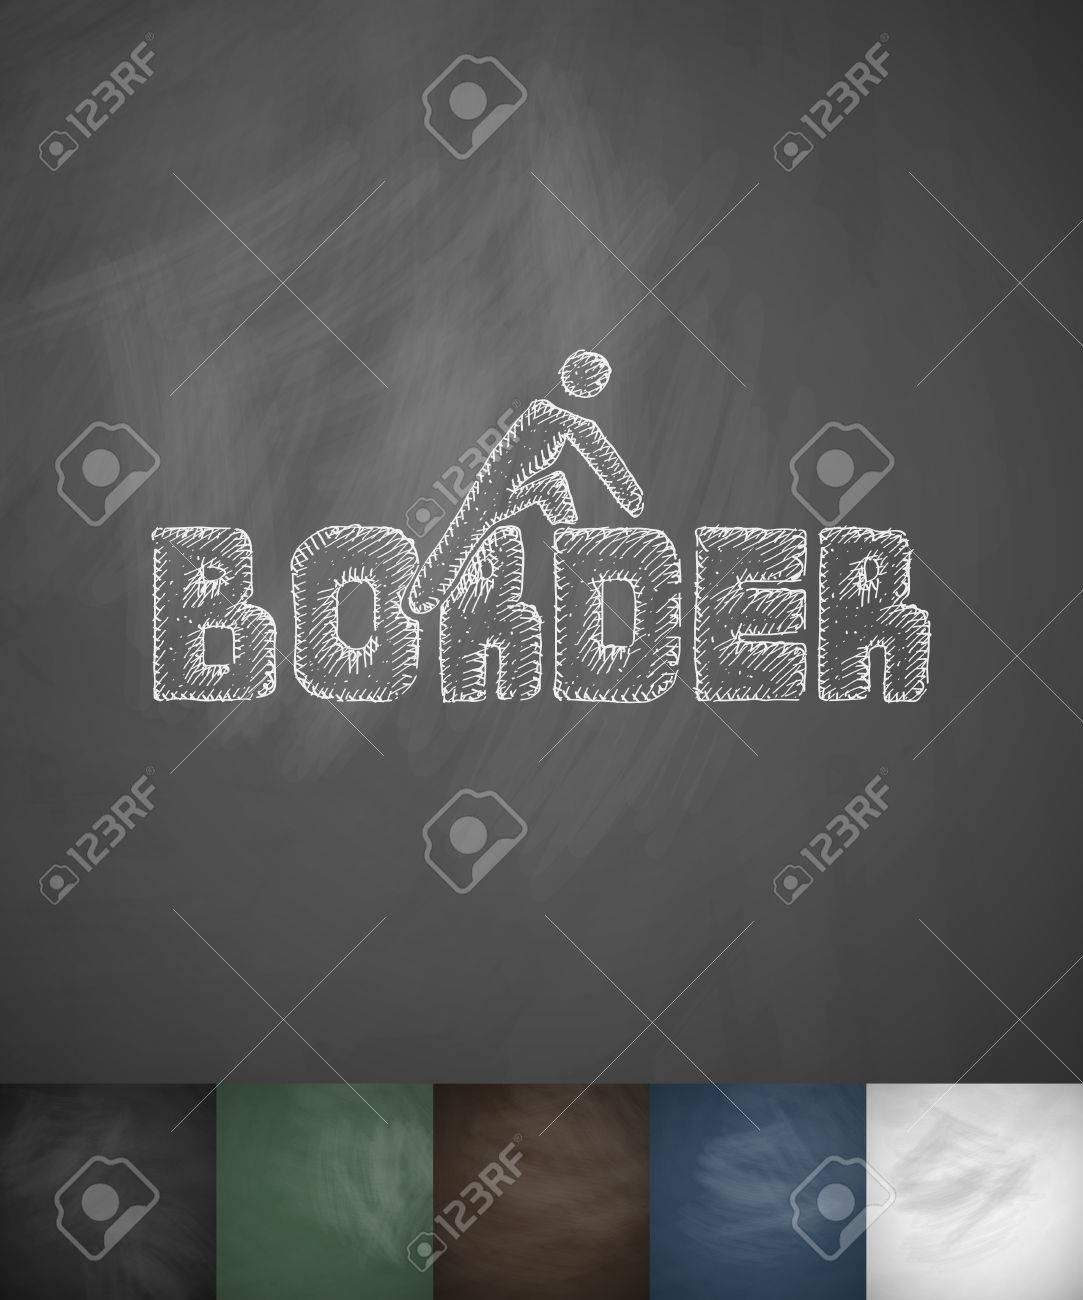 BORDER Icon. Hand Drawn Vector Illustration. Chalkboard Design Stock Vector    56876554